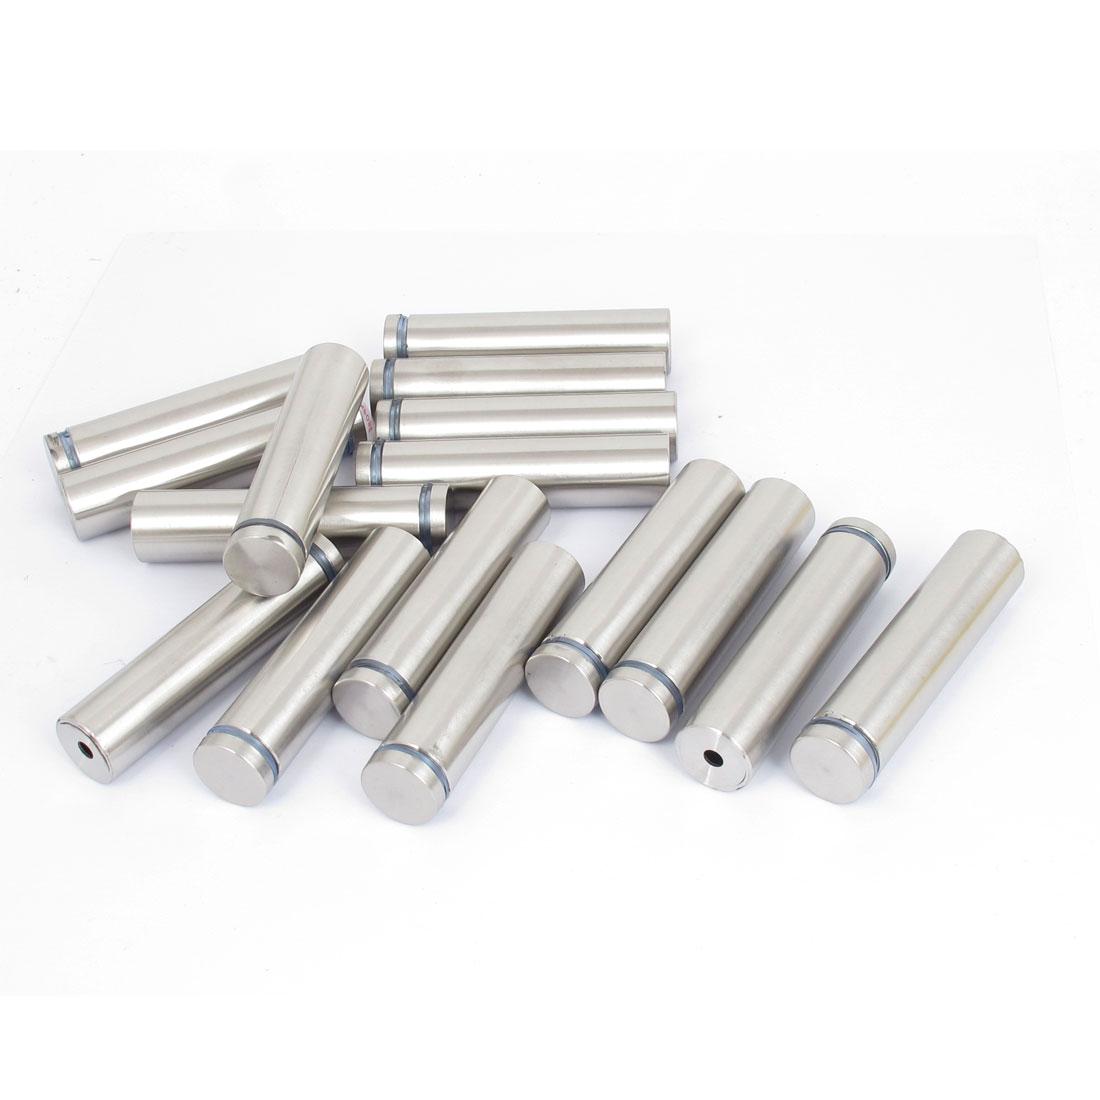 19mm x 80mm Stainless Steel Advertising Frameless Glass Standoff Pins 16pcs